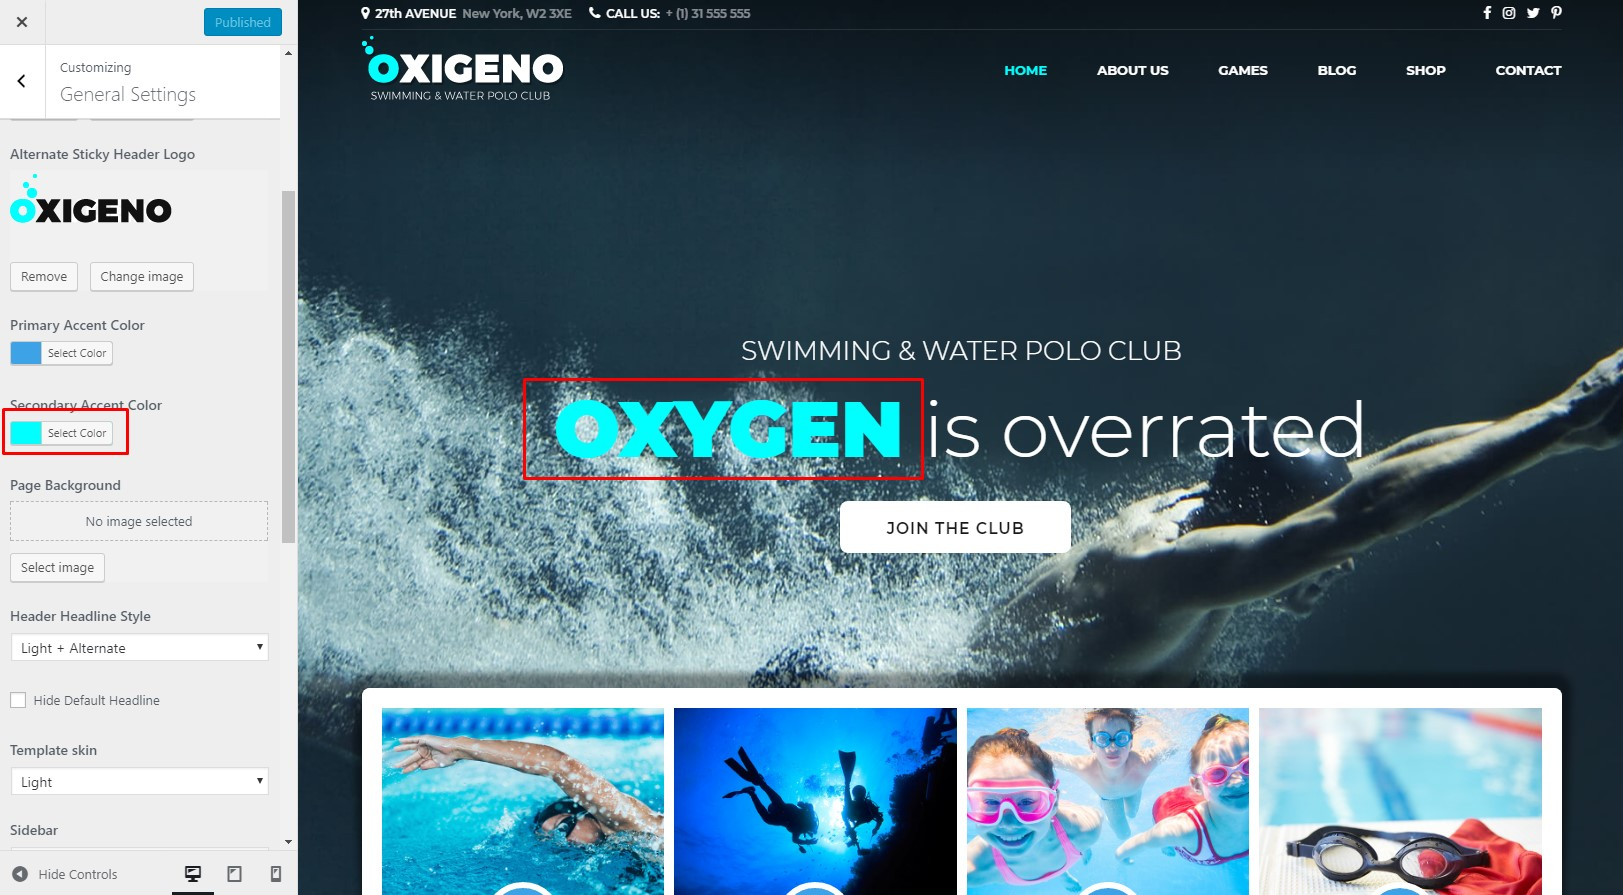 https://documentation.bold-themes.com/oxigeno/wp-content/uploads/sites/28/2018/01/alternate-color.jpg